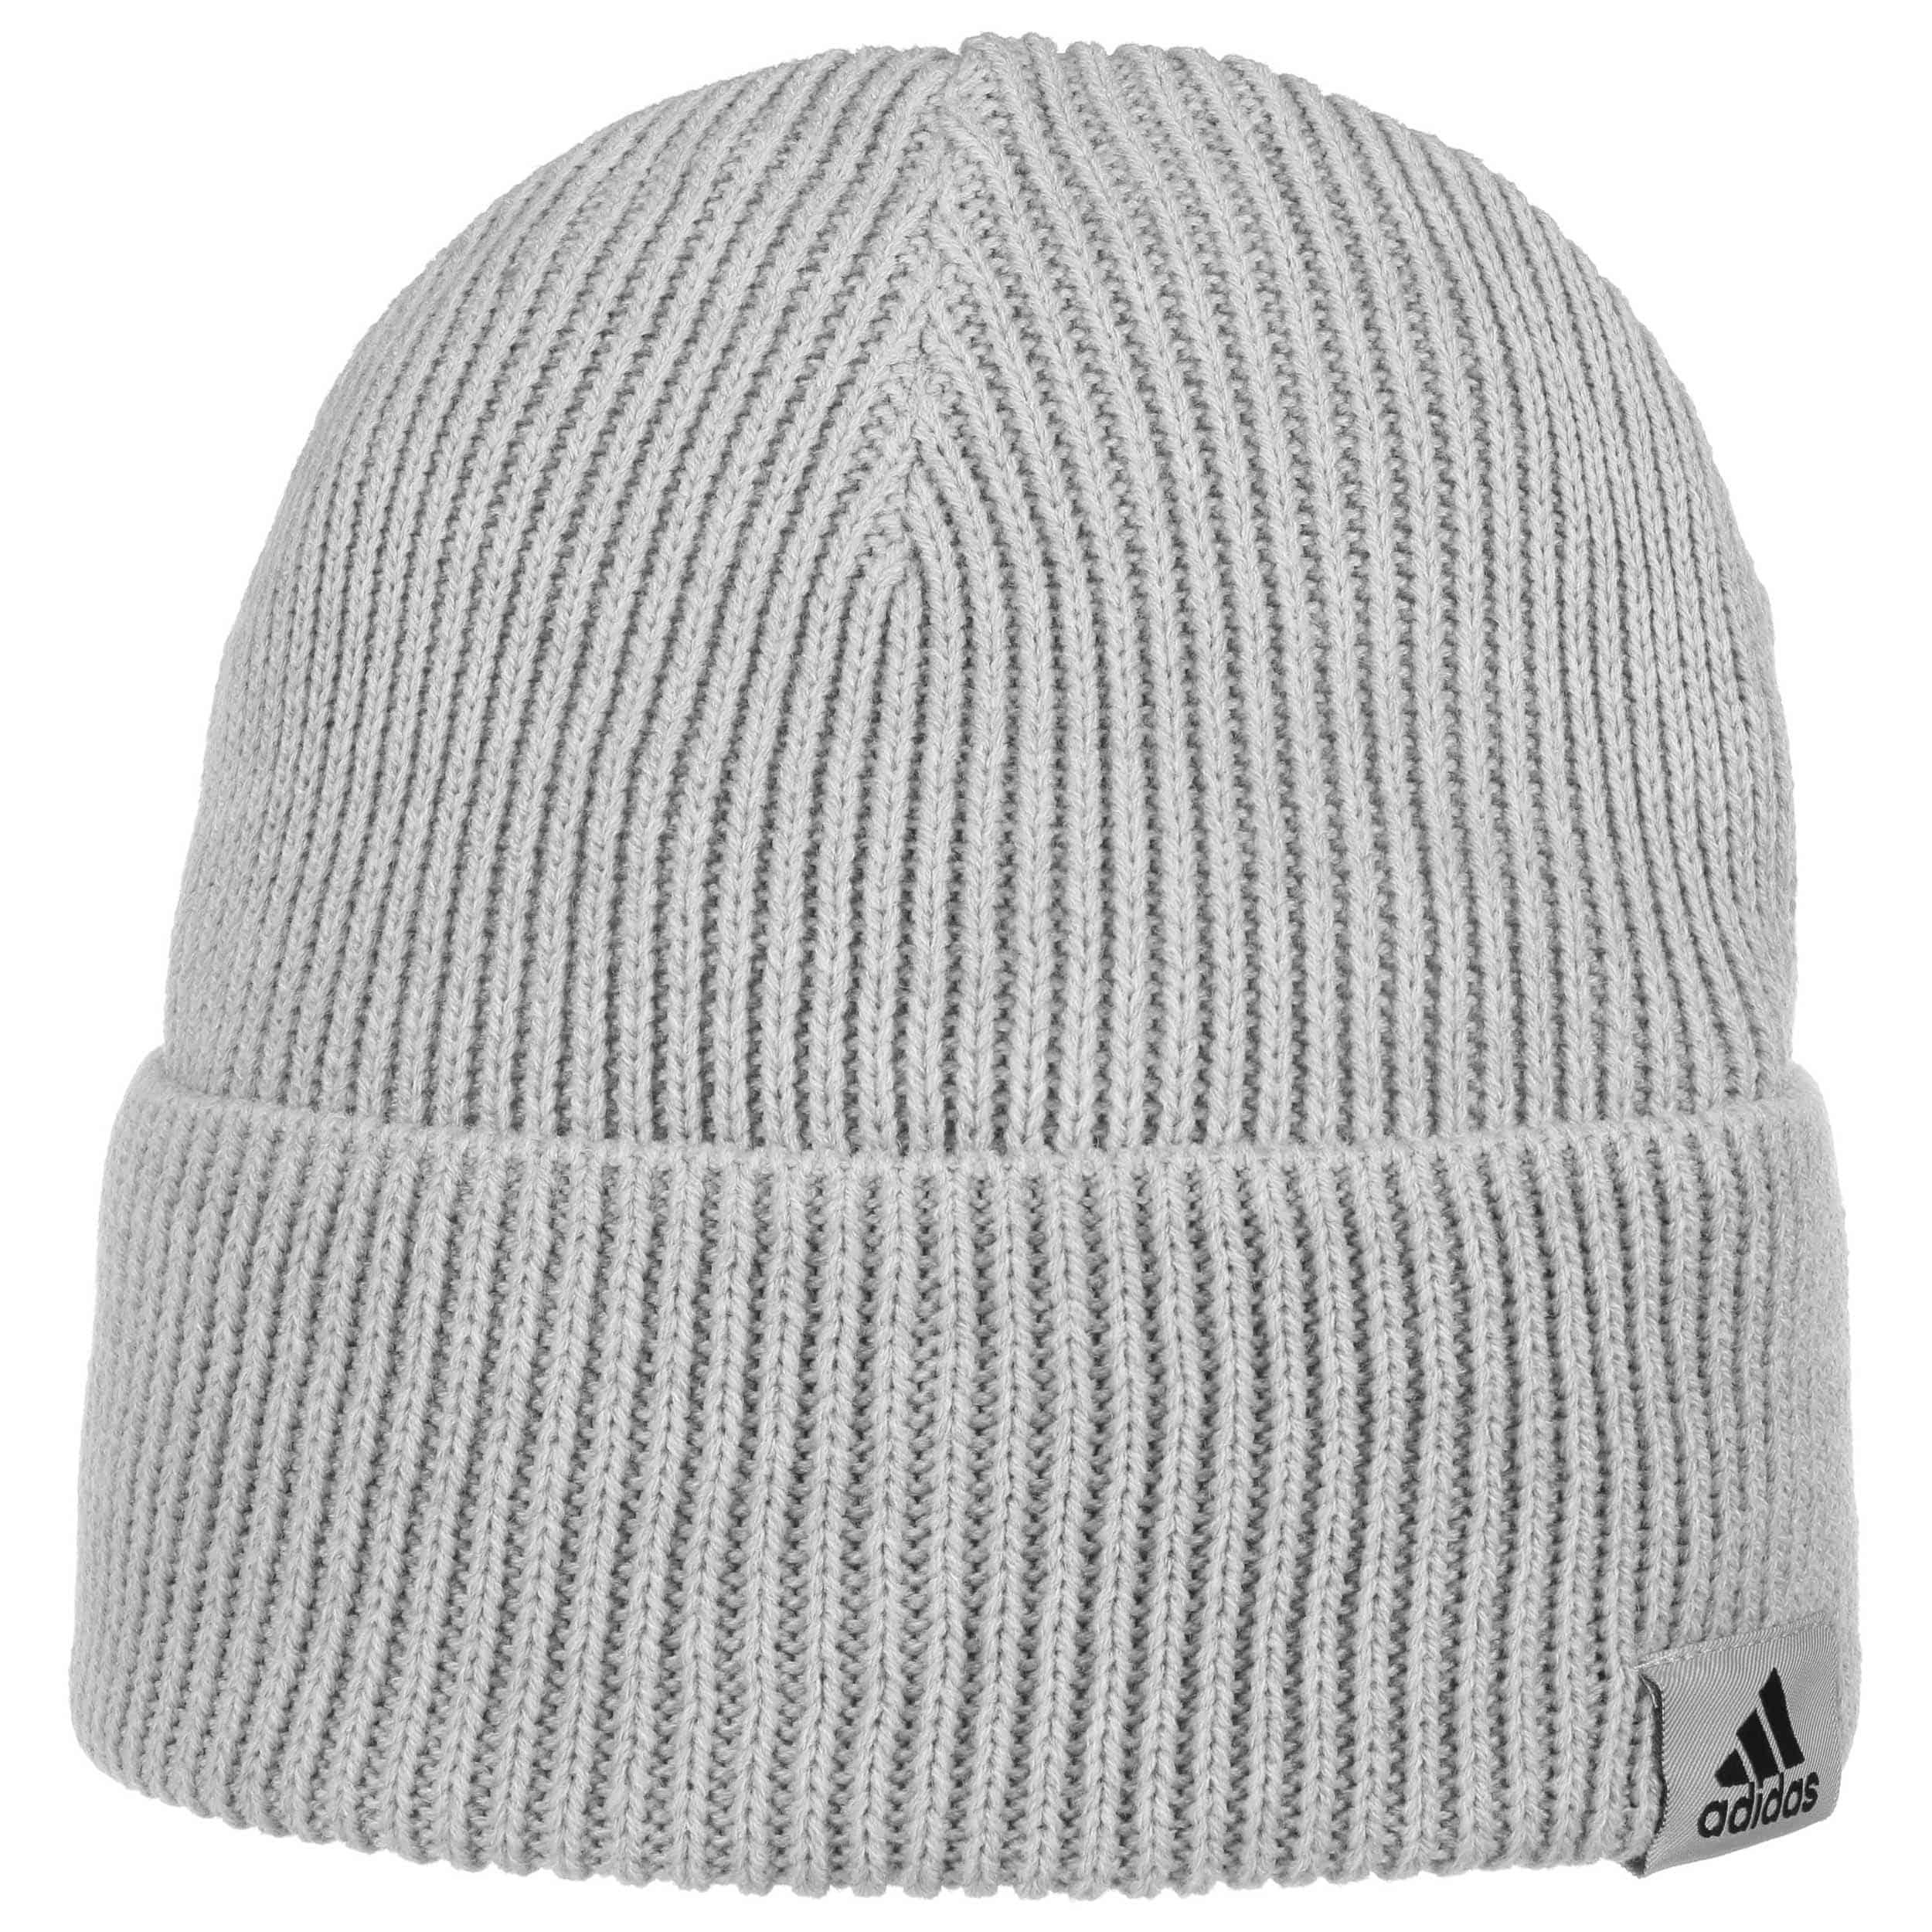 ... Perf Woolie Beanie Hat by adidas - black 5 faa6d2c544b